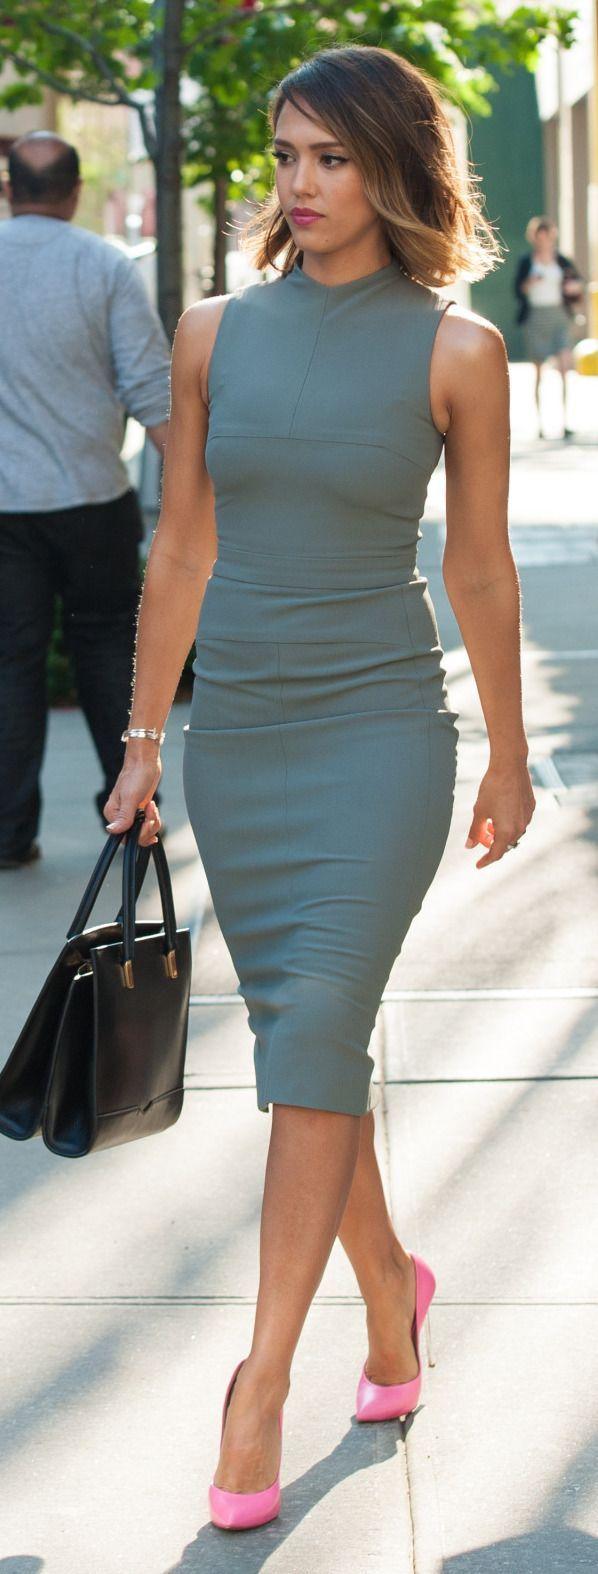 Celebrity wearing grey dresses images